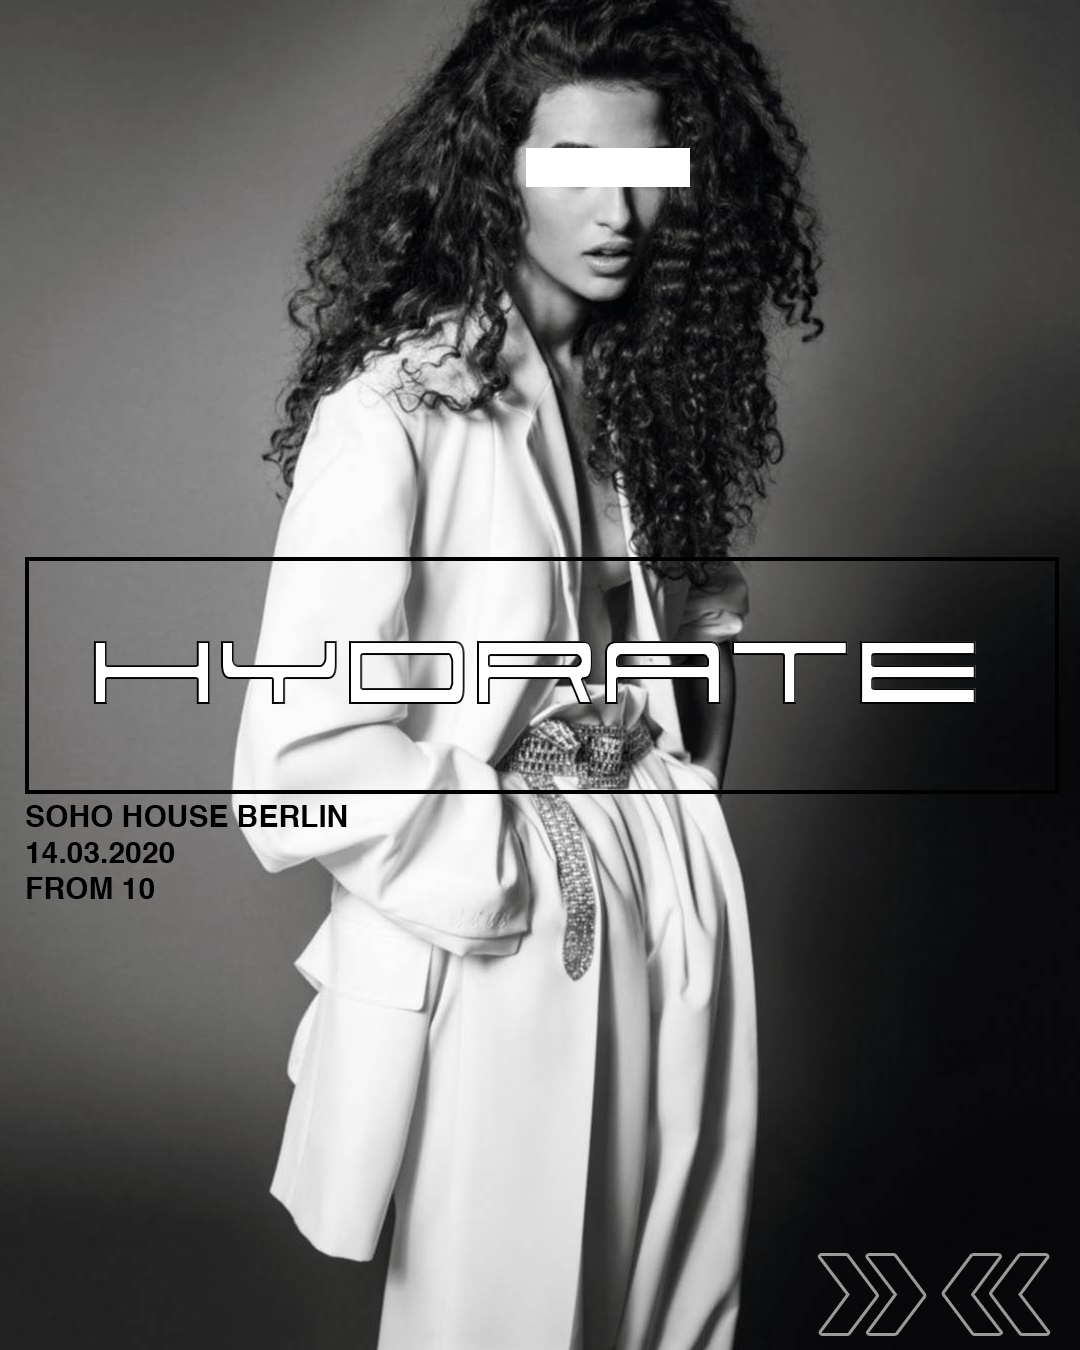 hydrate2i